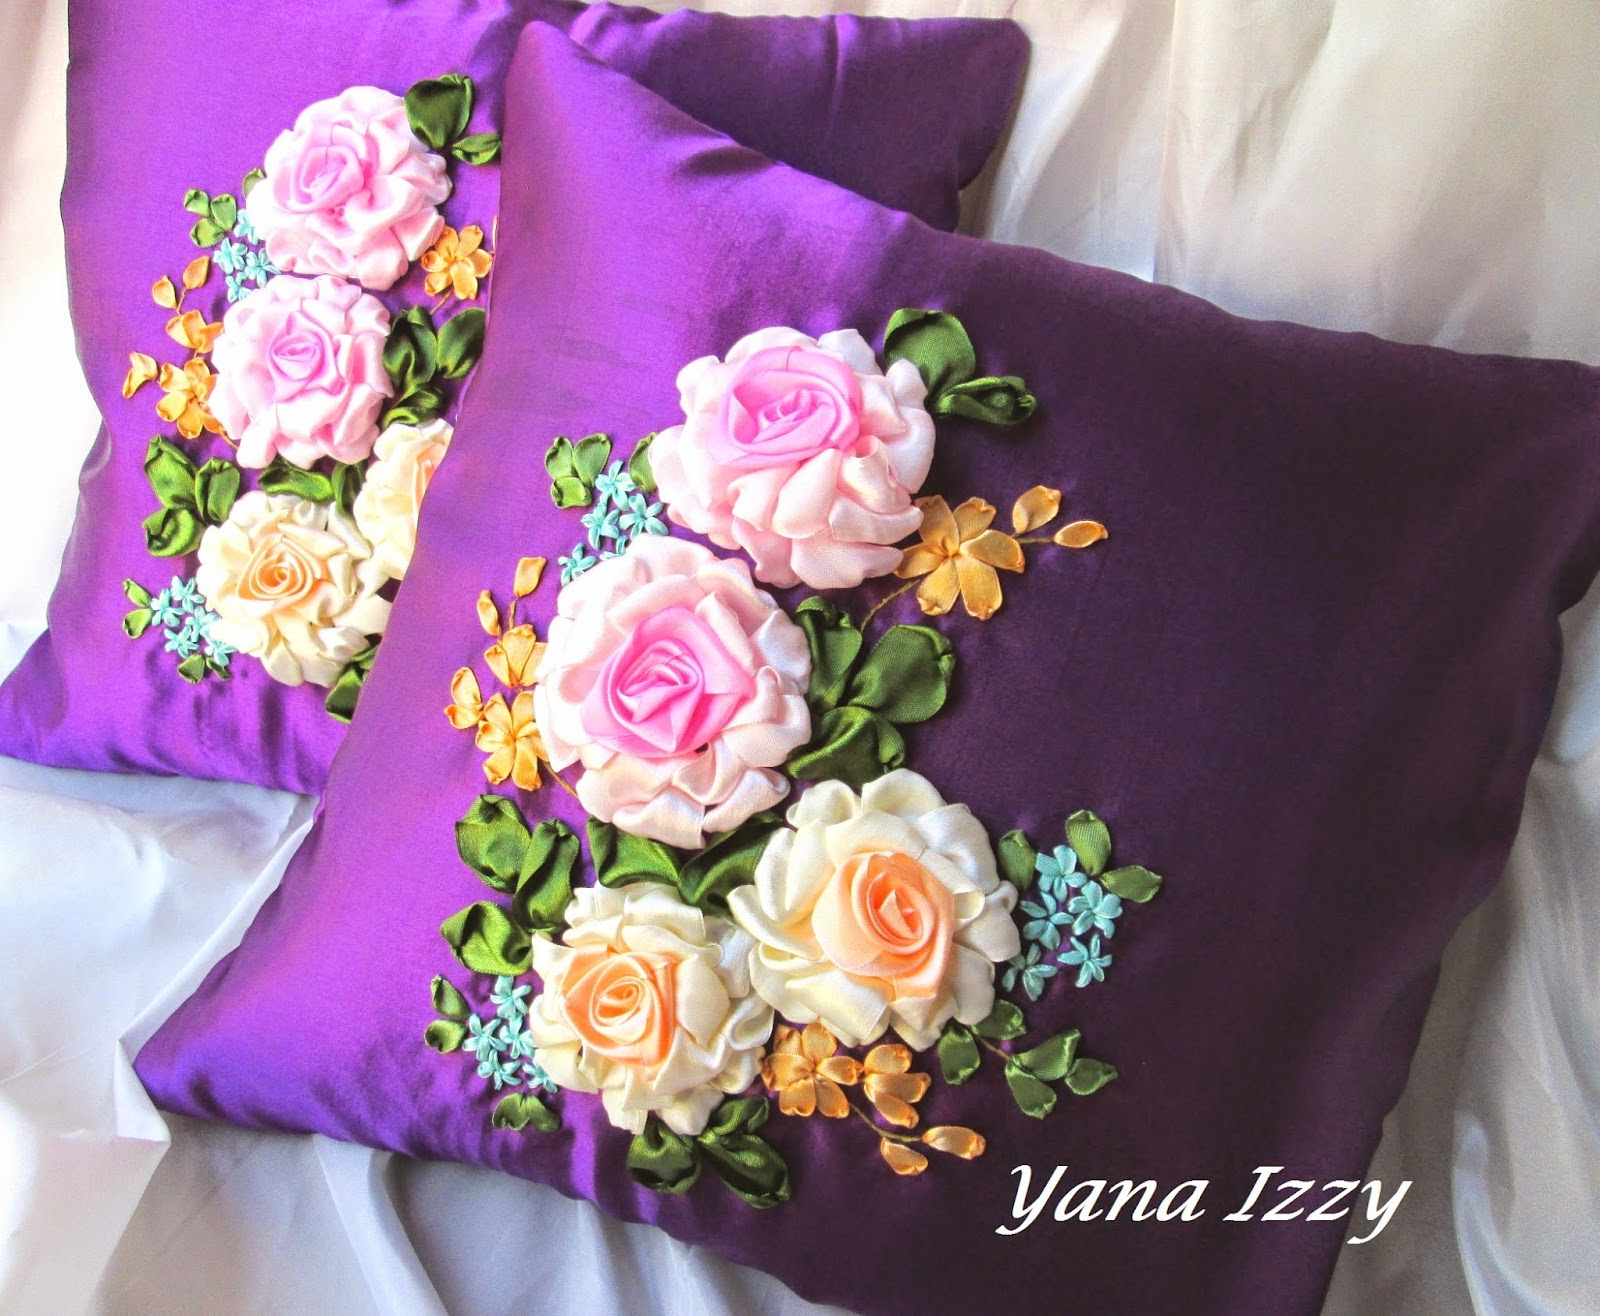 Yana izzy s creative zone ribbon embroidery cushion cover